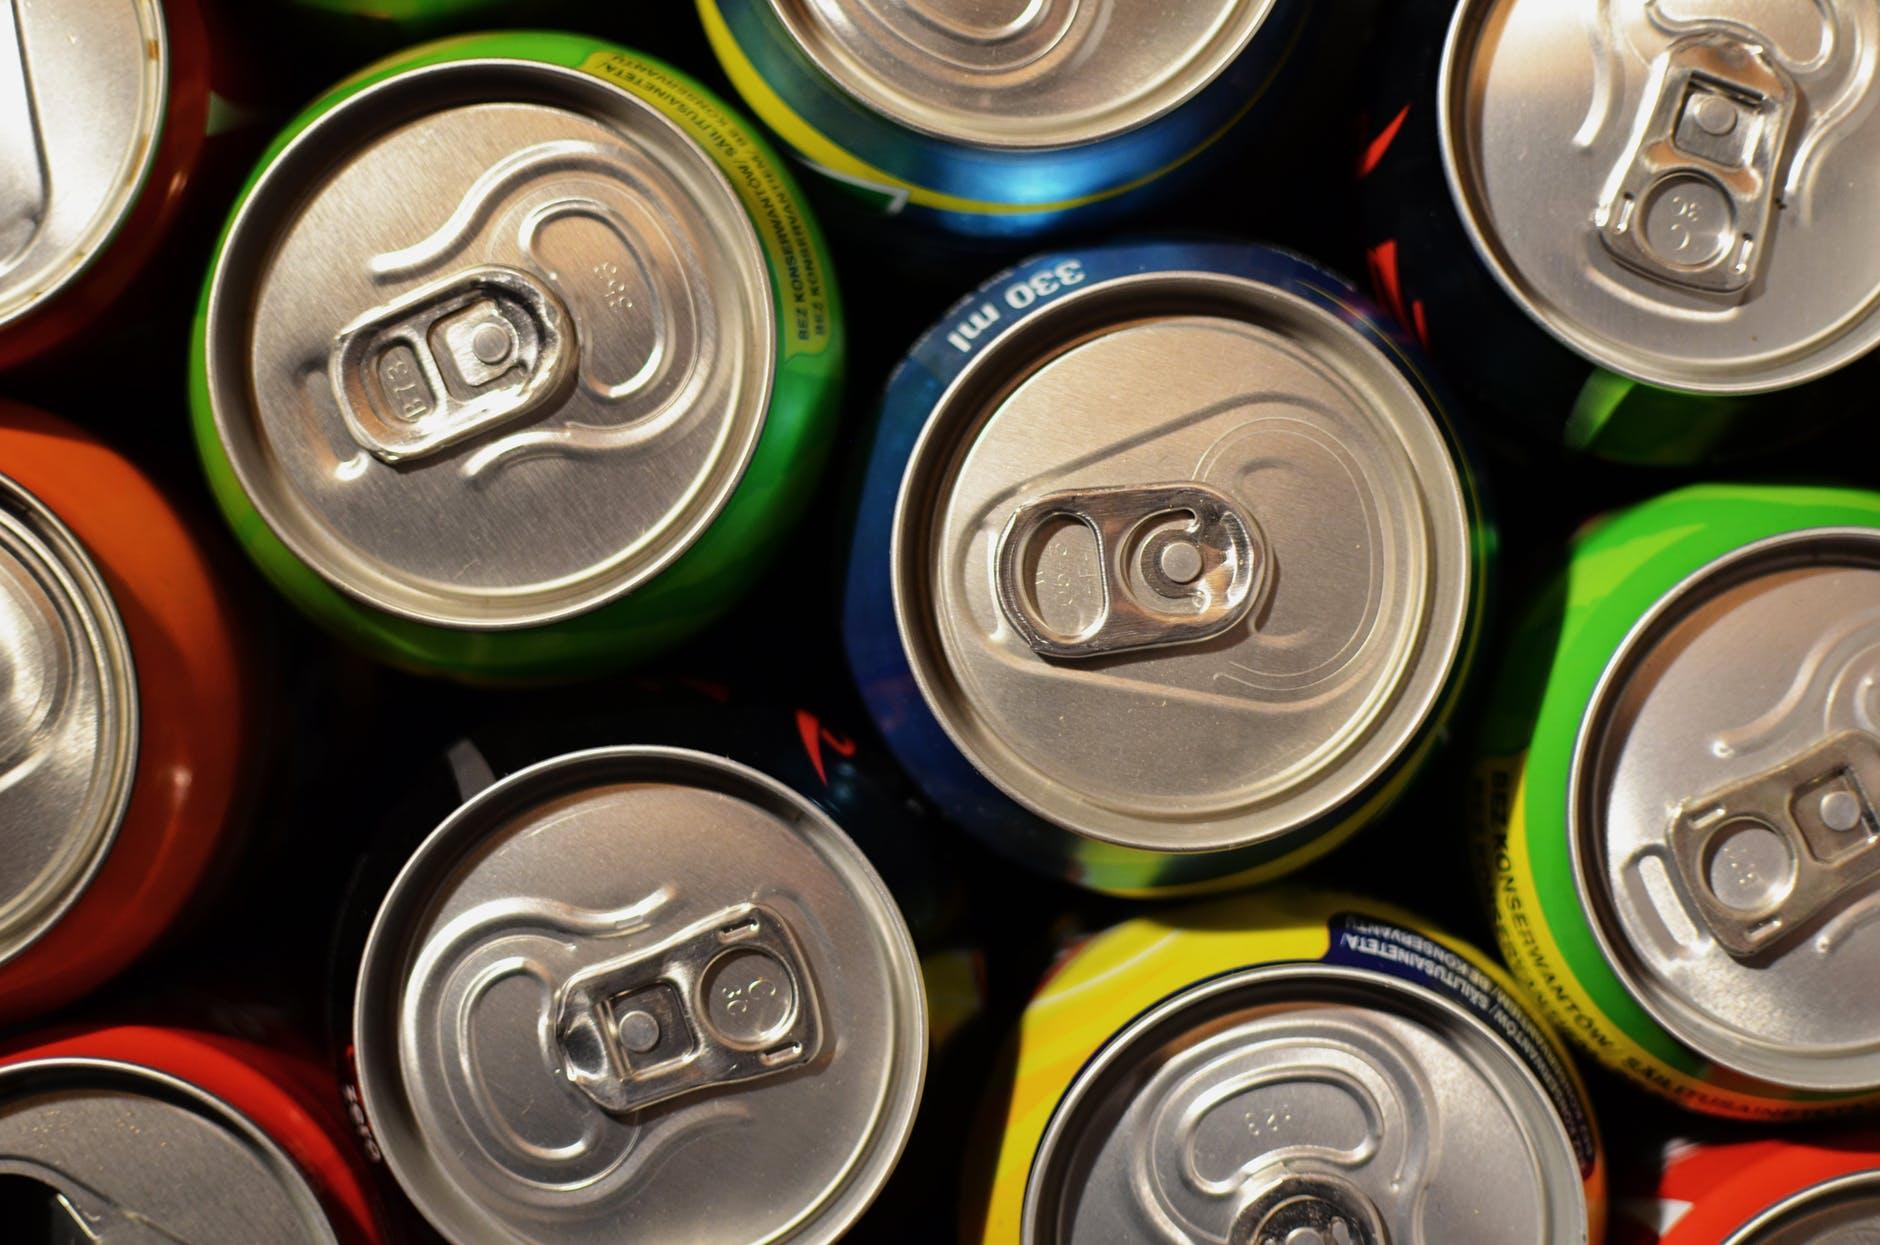 quit soda|quit-soda|how-to-quit-drinking-soda